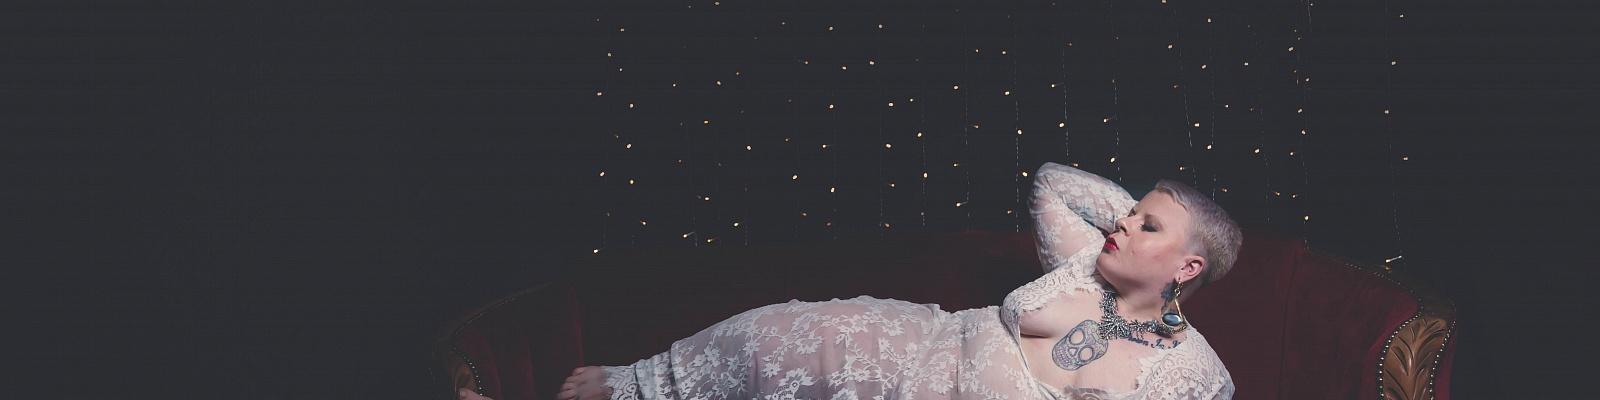 Venus Gold's Cover Photo